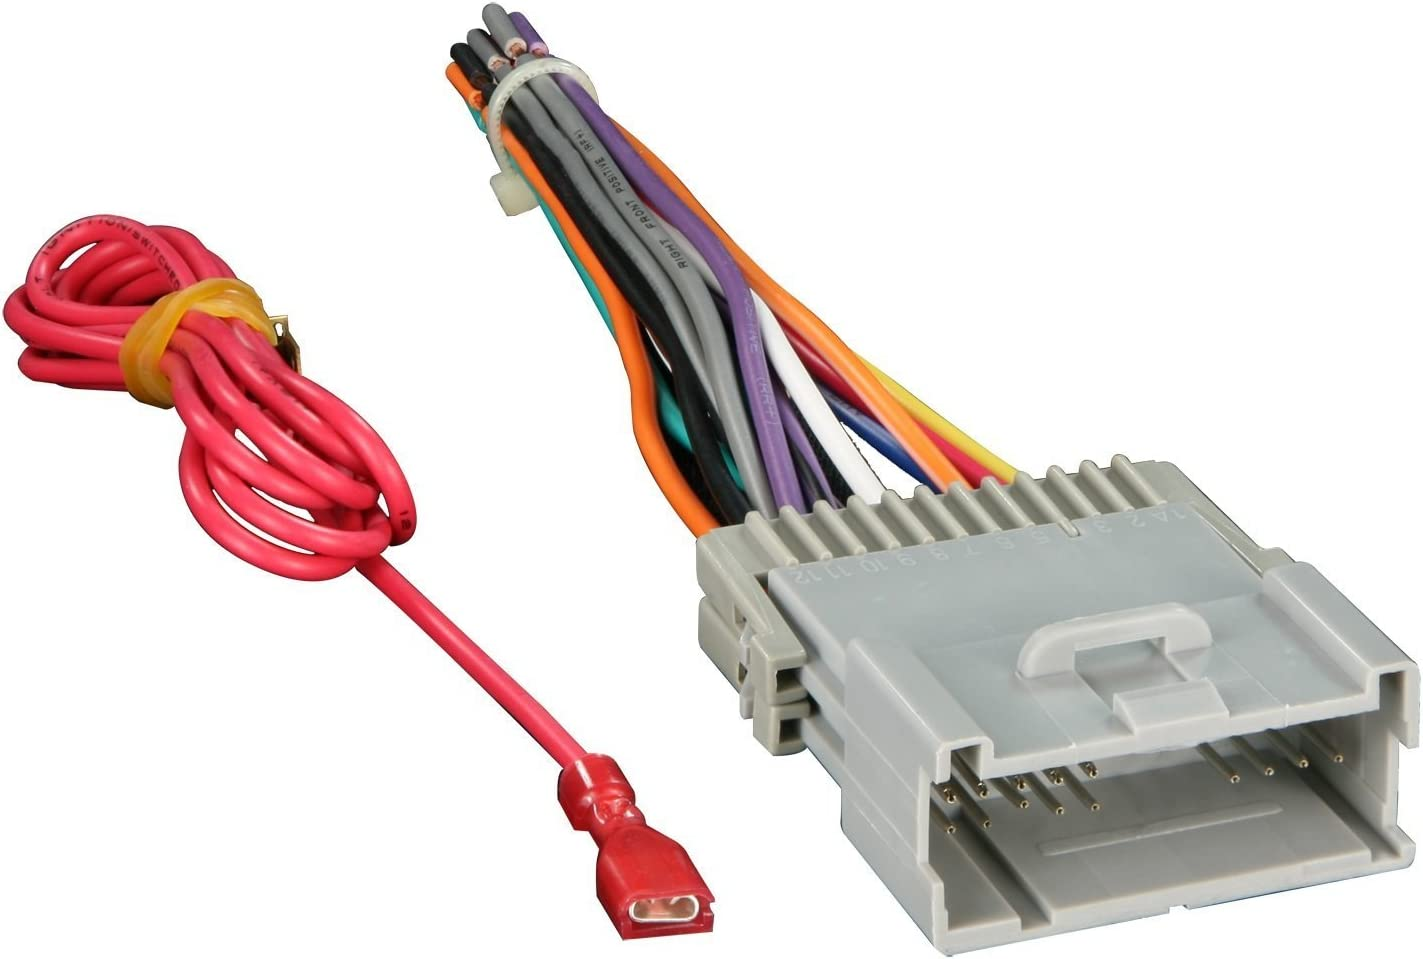 Metra 2-DIN Installation Kit for Radio BT w//Sirius Vehicle Radio Tuner Kenwood Multimedia Receiver Kenwood Rearview Wide Angle View Backup Camera Metra Antenna Adapter /& Metra Radio Wiring Harness